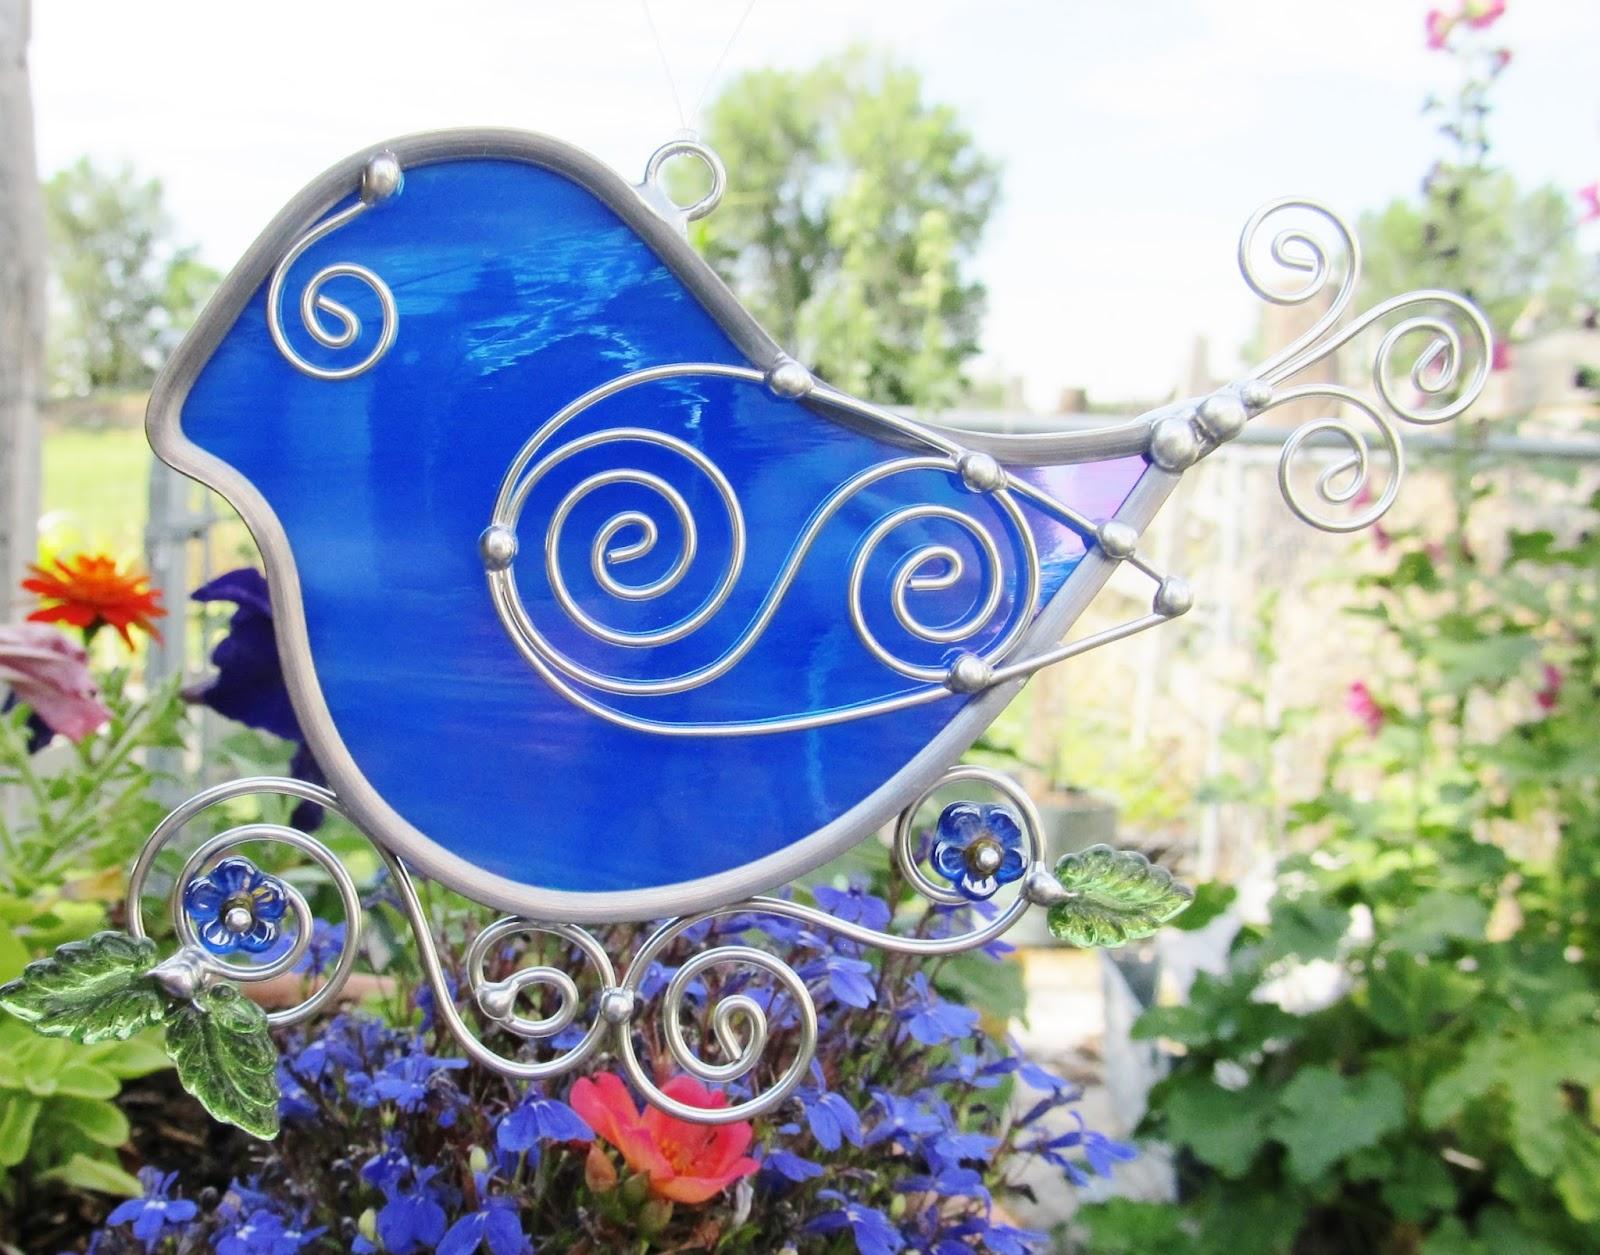 Stained Glass Blue Birds On Wire Center Grvkmr123 Circuit Diagram For Rc Cartransmitter Jasglassart Original Designs In Iridescent Rh Blogspot Com Medical